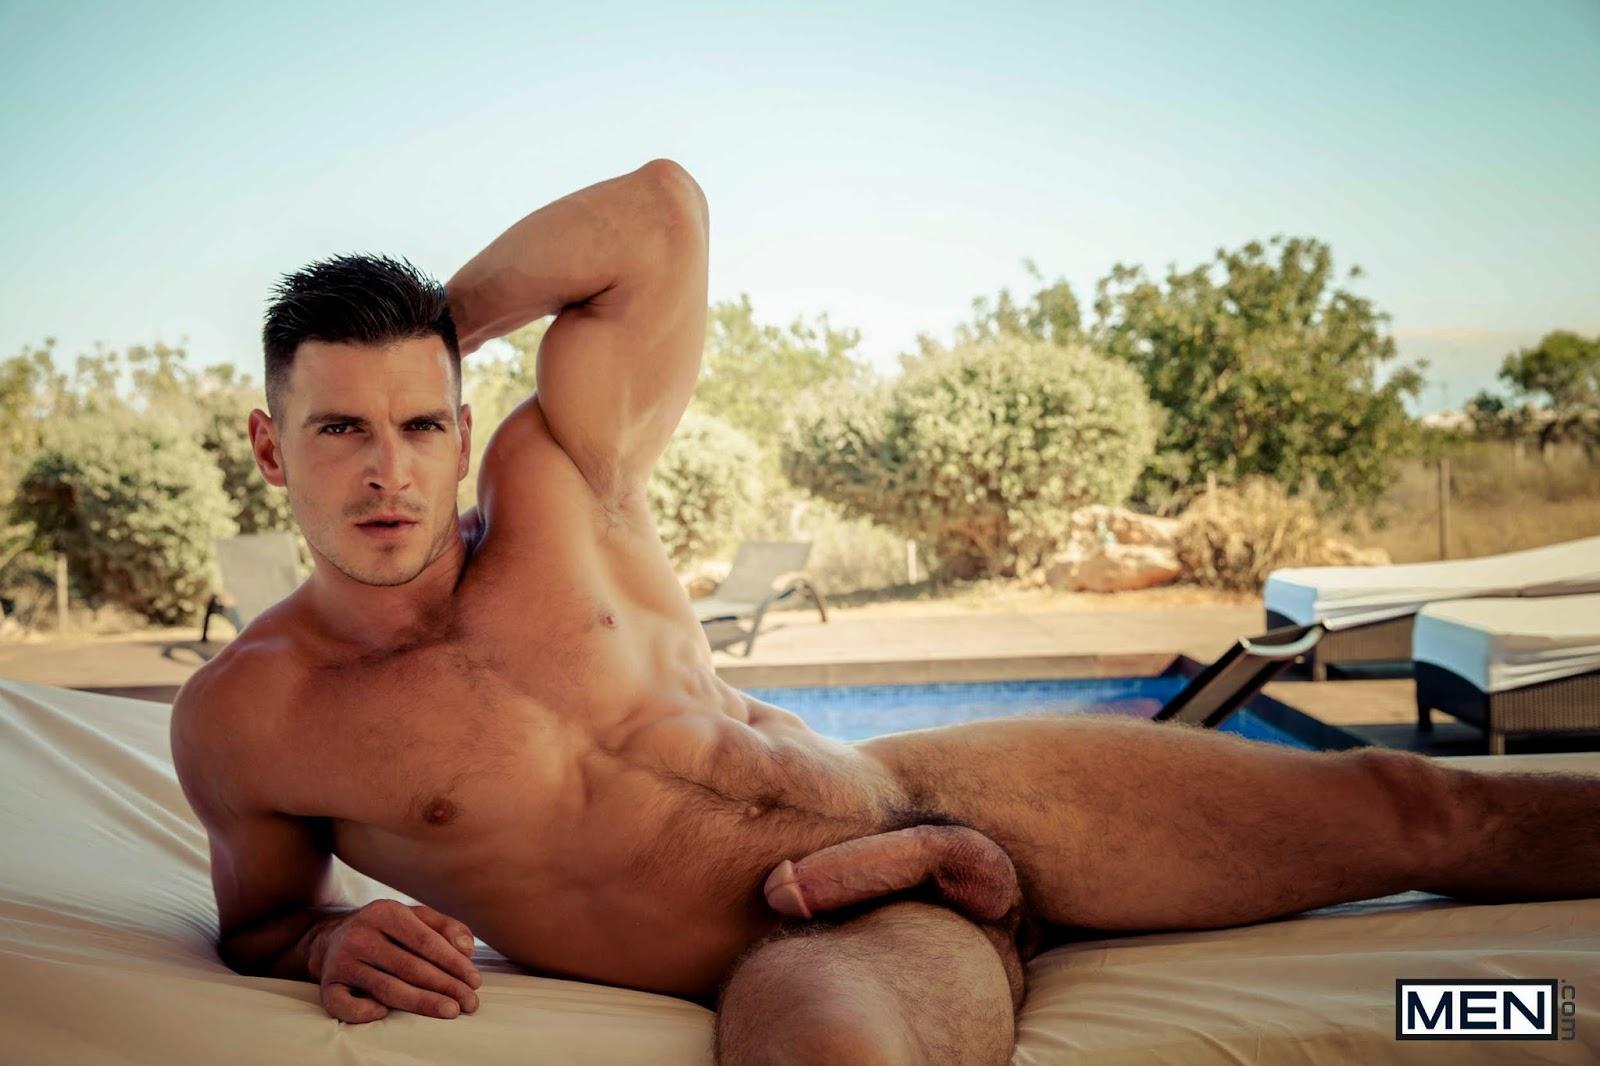 самые сексуальные порно актеры мужчины